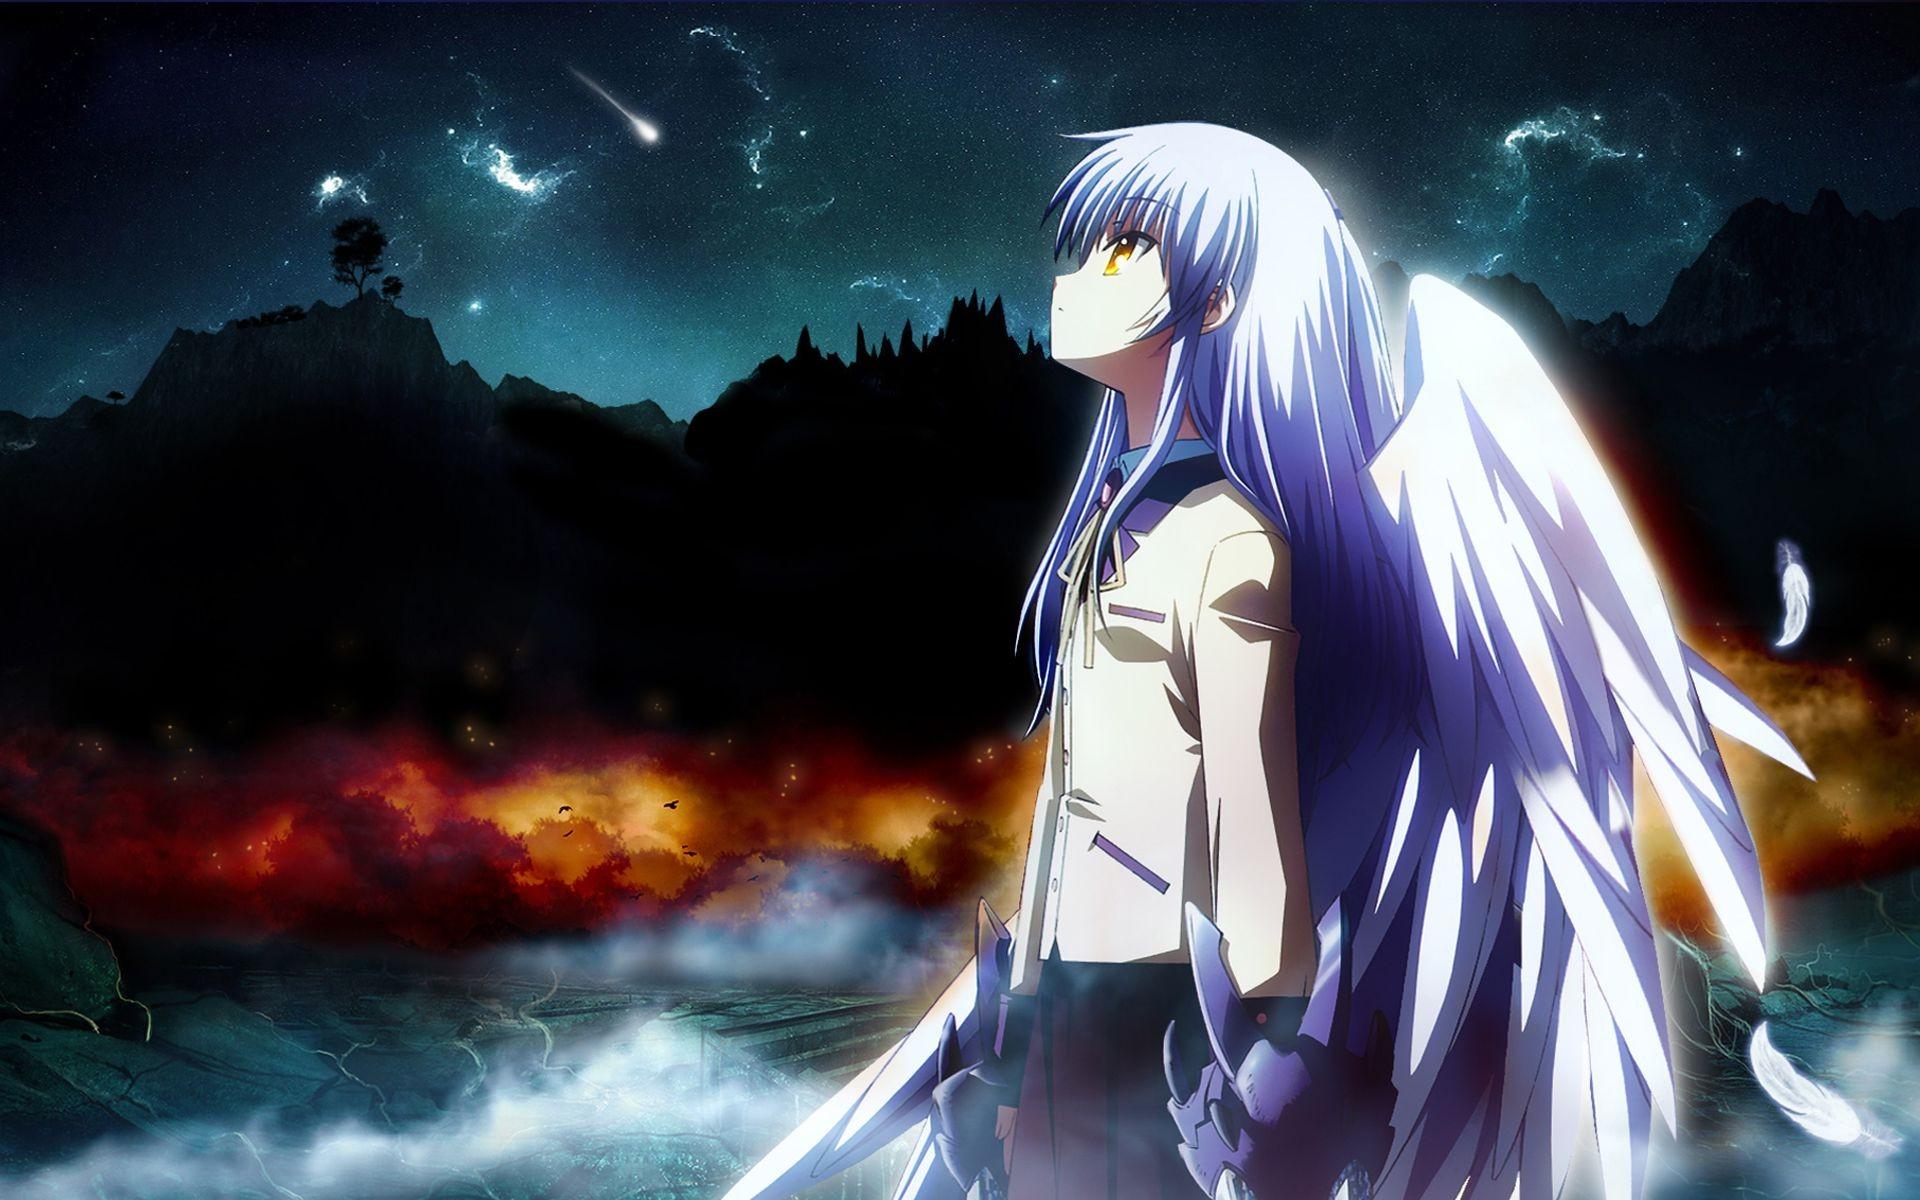 Angel Beats wallpaper ·① Download free amazing full HD ...